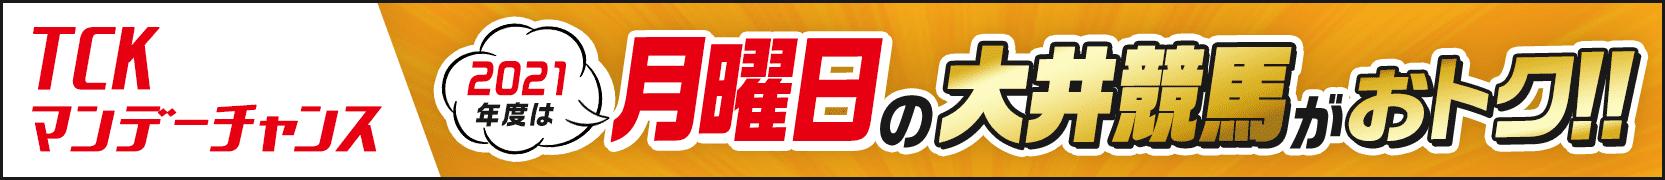 TCK×楽天競馬マンデーチャンスキャンペーン(第10回)